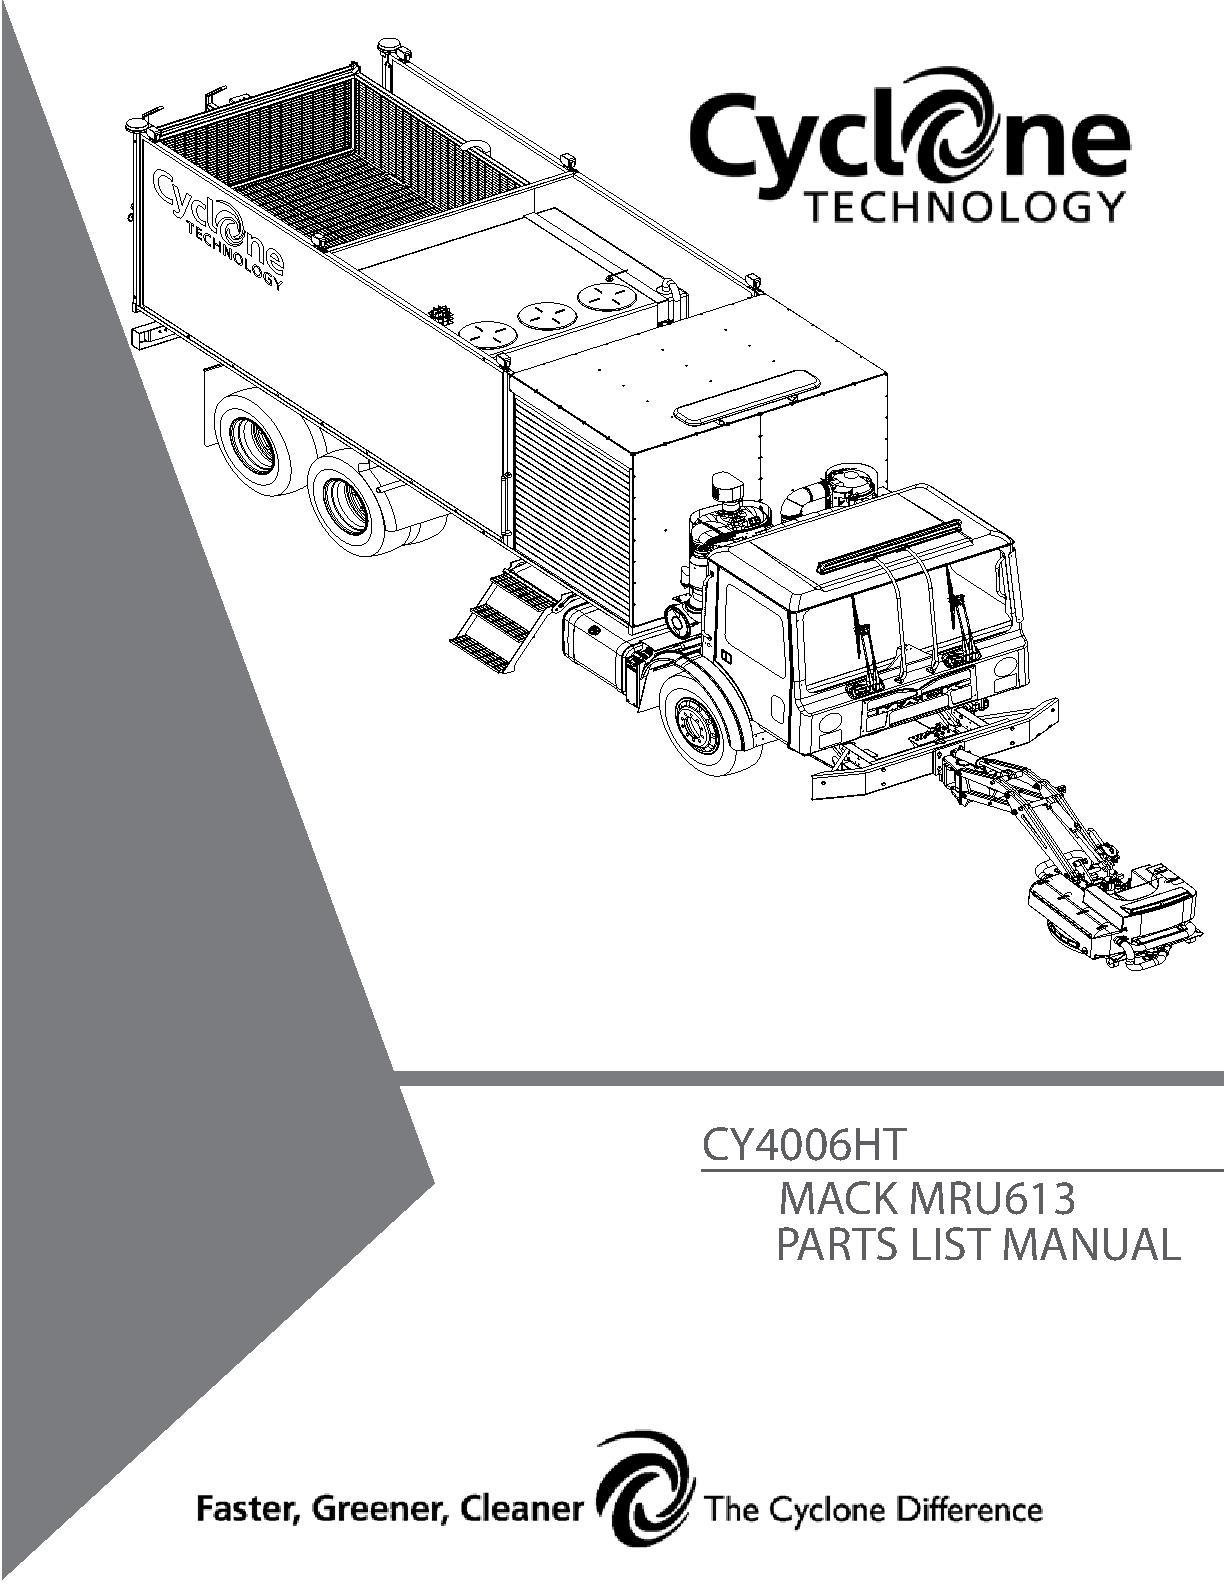 CY4006HTMAC PARTS MANUAL VER_1.pdf   PDF Host